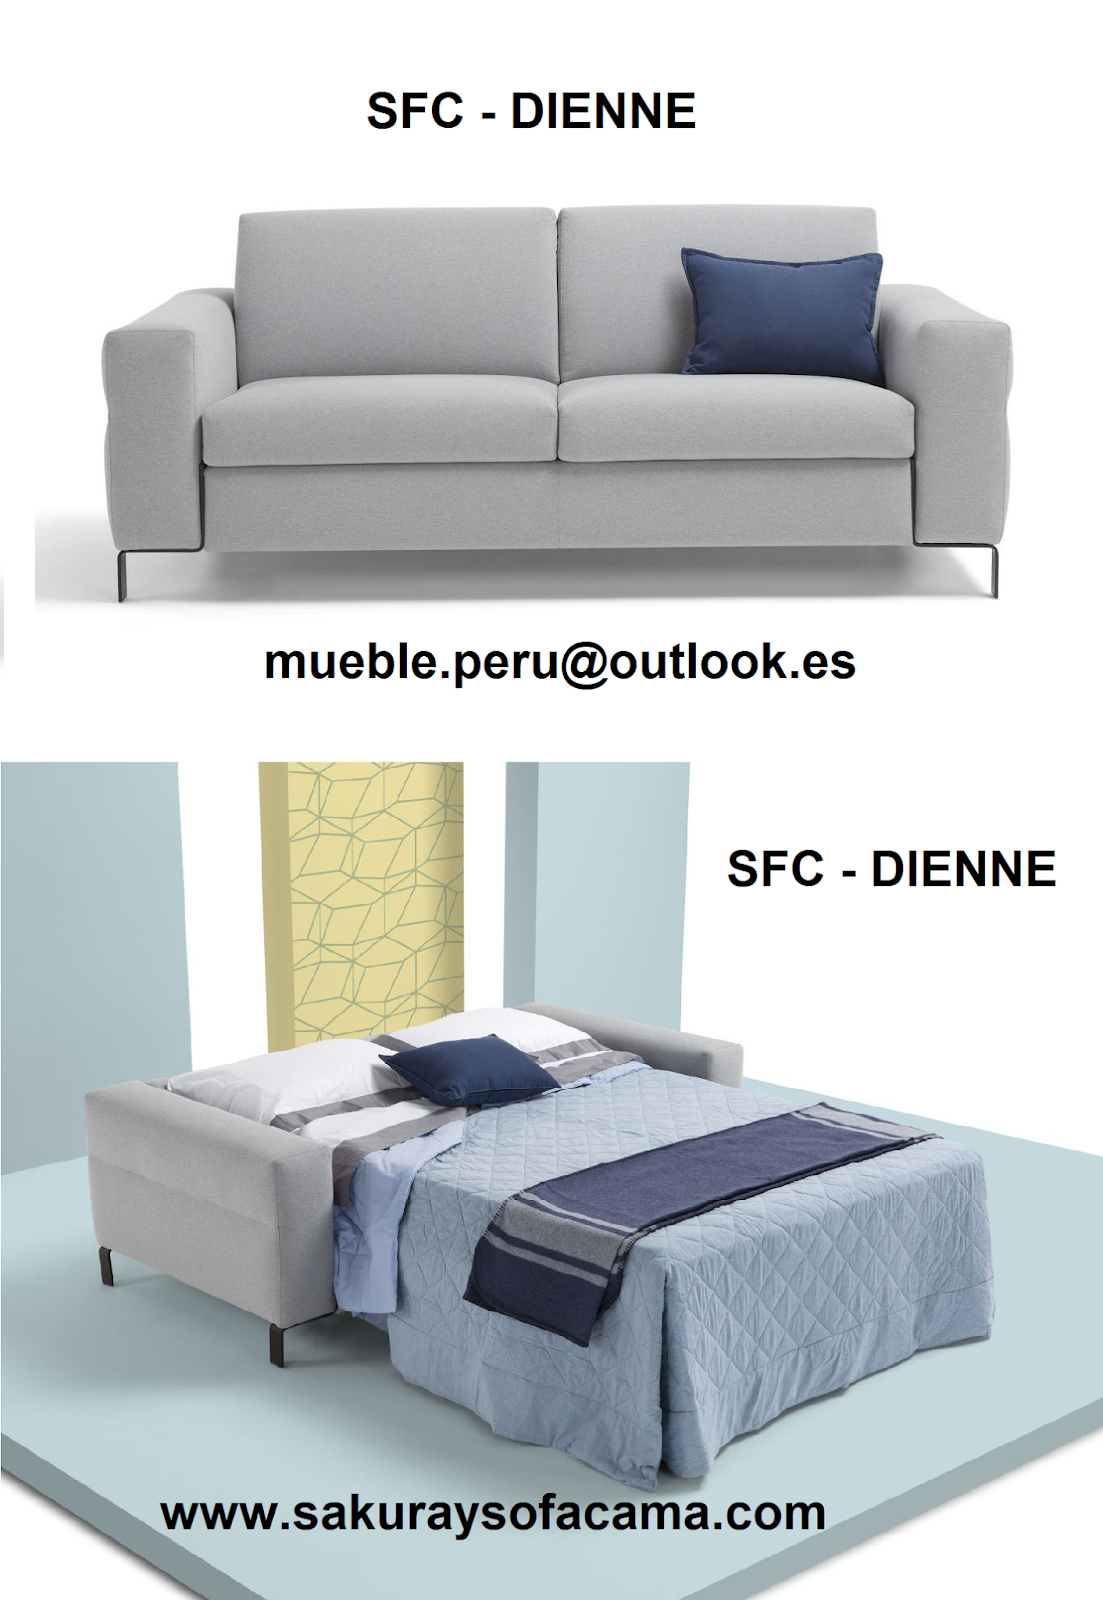 Sofa Sfc King Furniture Felix Mueble Peru Sakuray Cama Americano Dienne